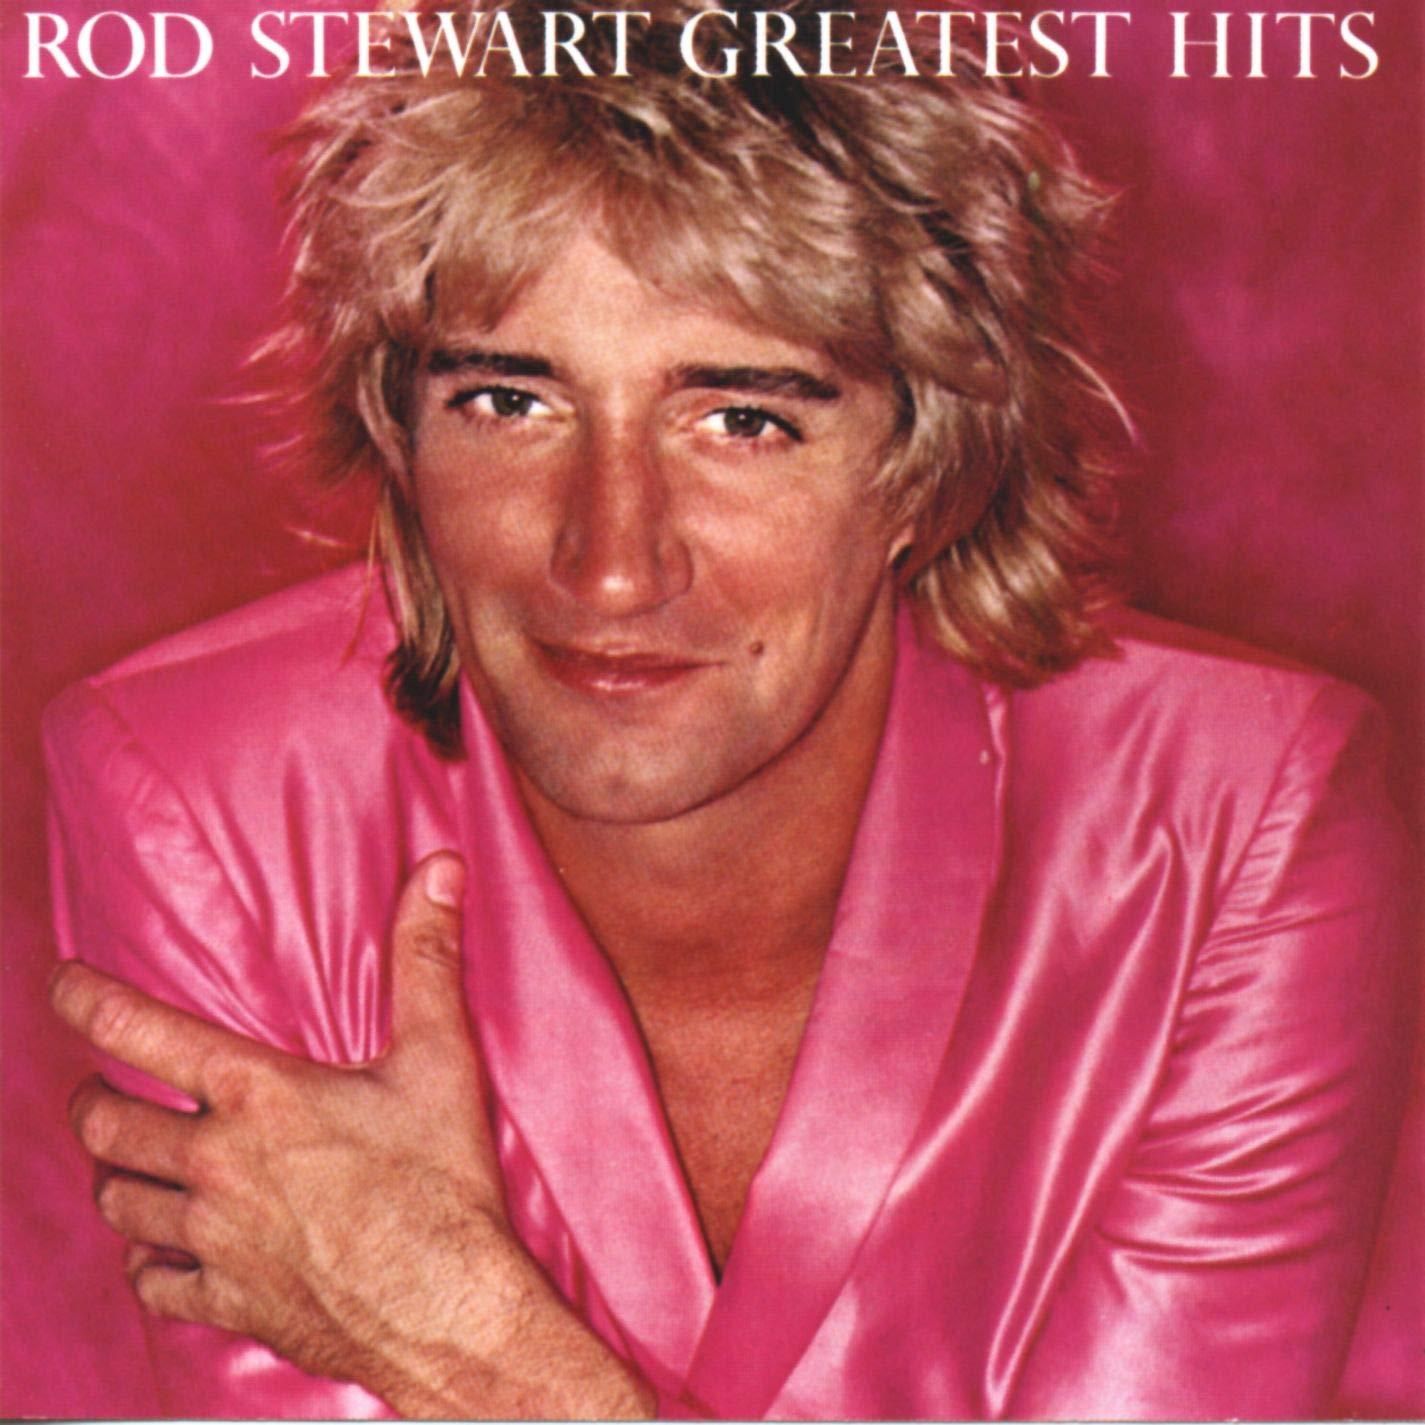 Rod Stewart – Greatest Hits (1990) [FLAC]